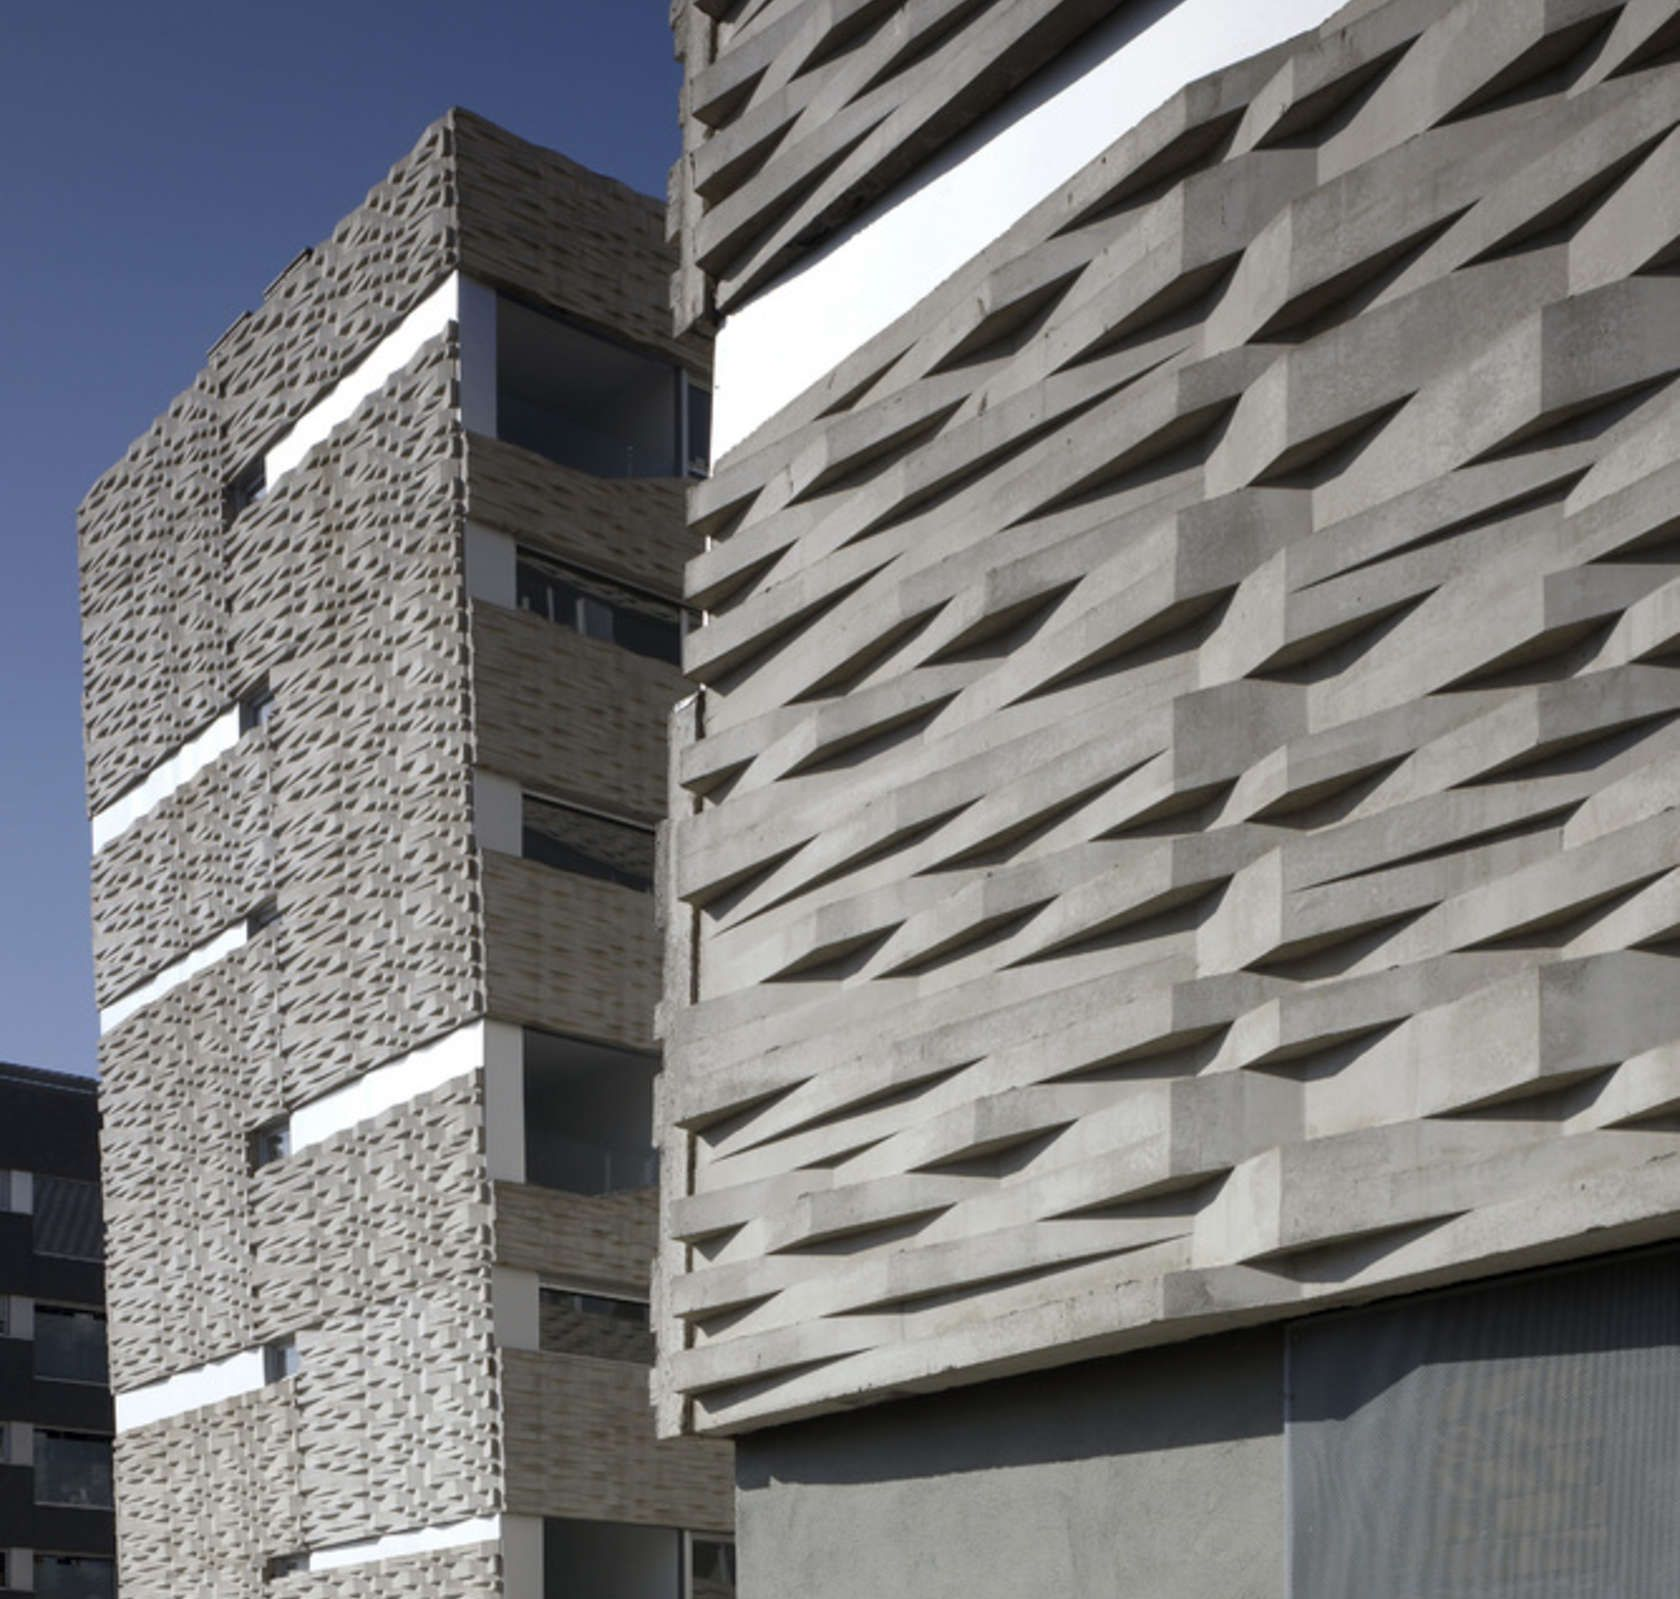 Concrete Building Facade : Take the rough with smooth textured concrete